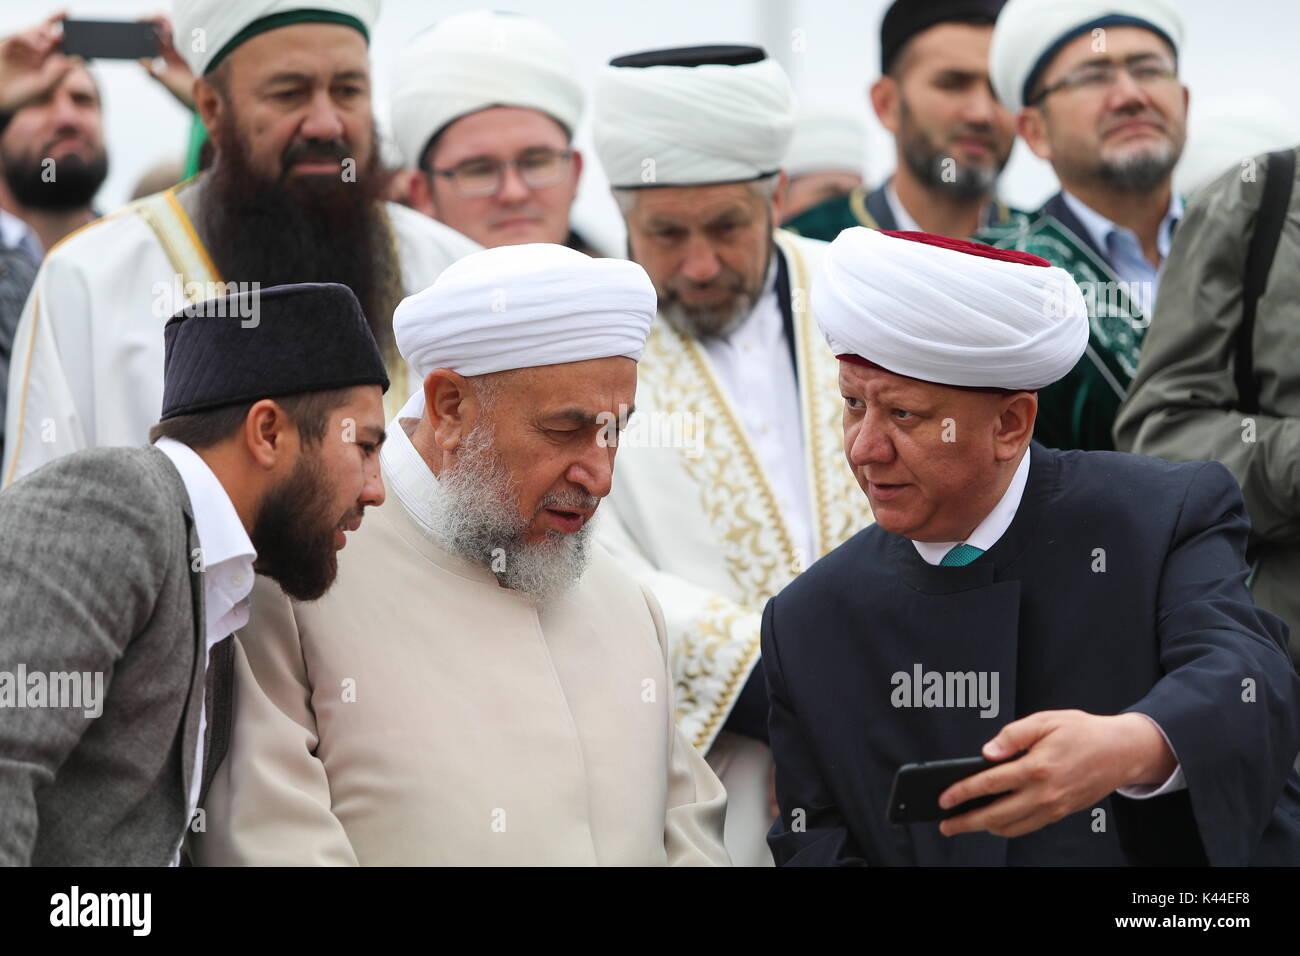 Arabic Teacher Abdul Razzaq Al Saadi C And Albir Krganov R Mufti Of Moscow Attend The Opening Bolgar Islamic Academy BIA